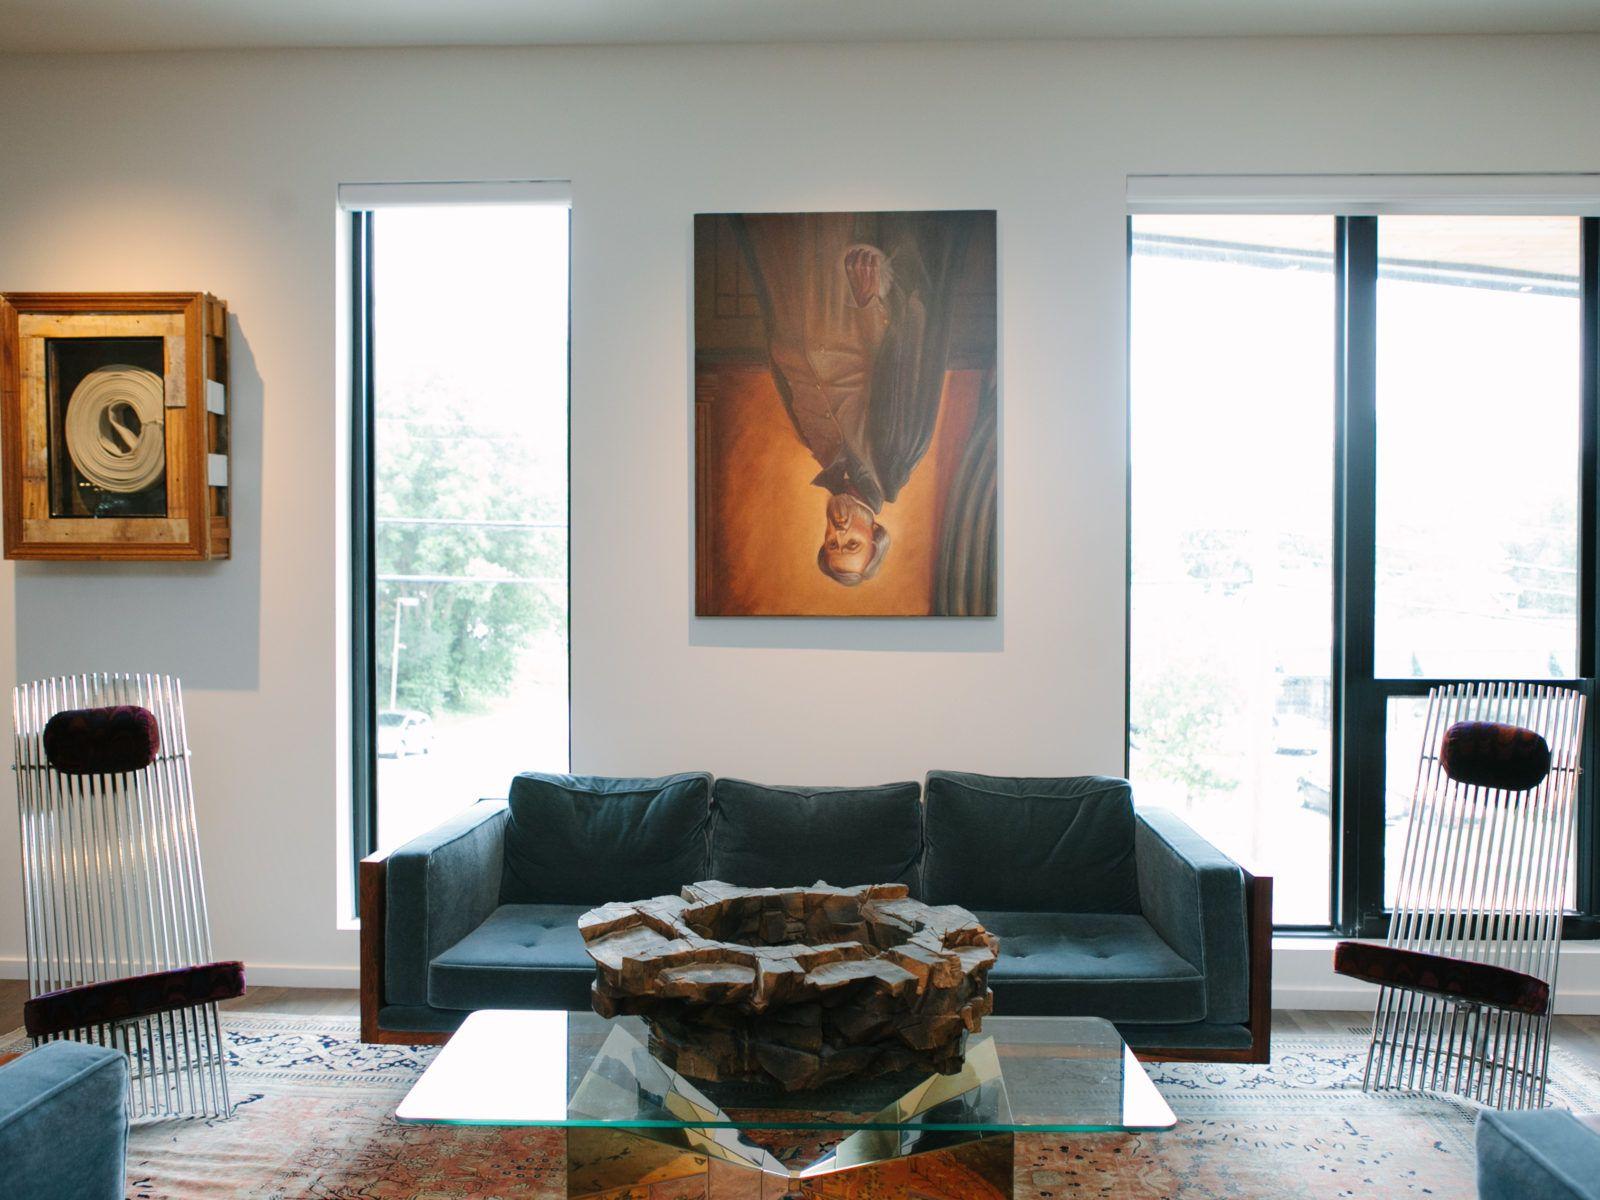 ÌMỌ̀ DÁRA Kansas city art institute, Home decor, African